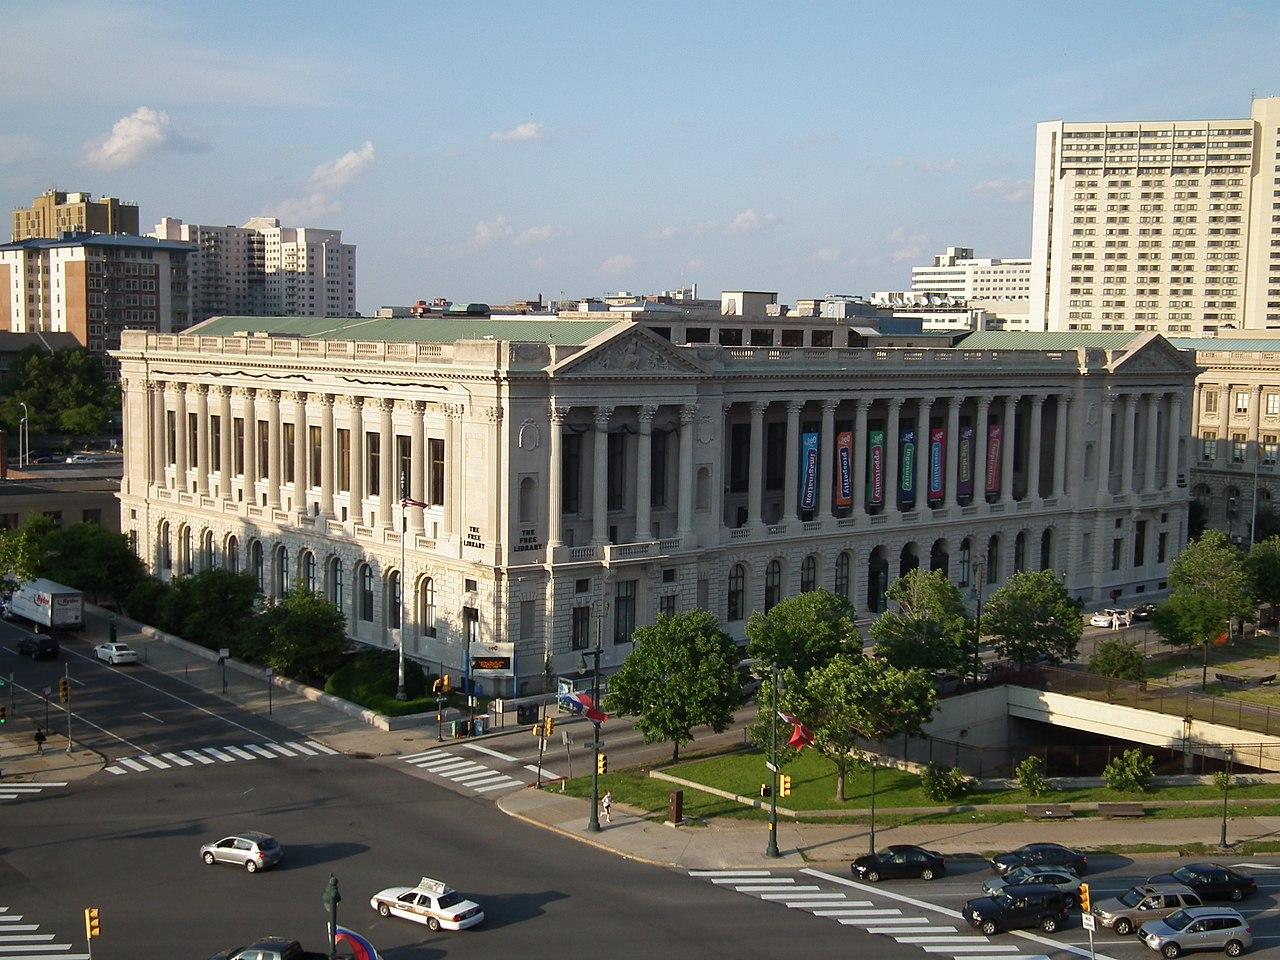 1280px-The_Free_Library_of_Philadelphia.jpg